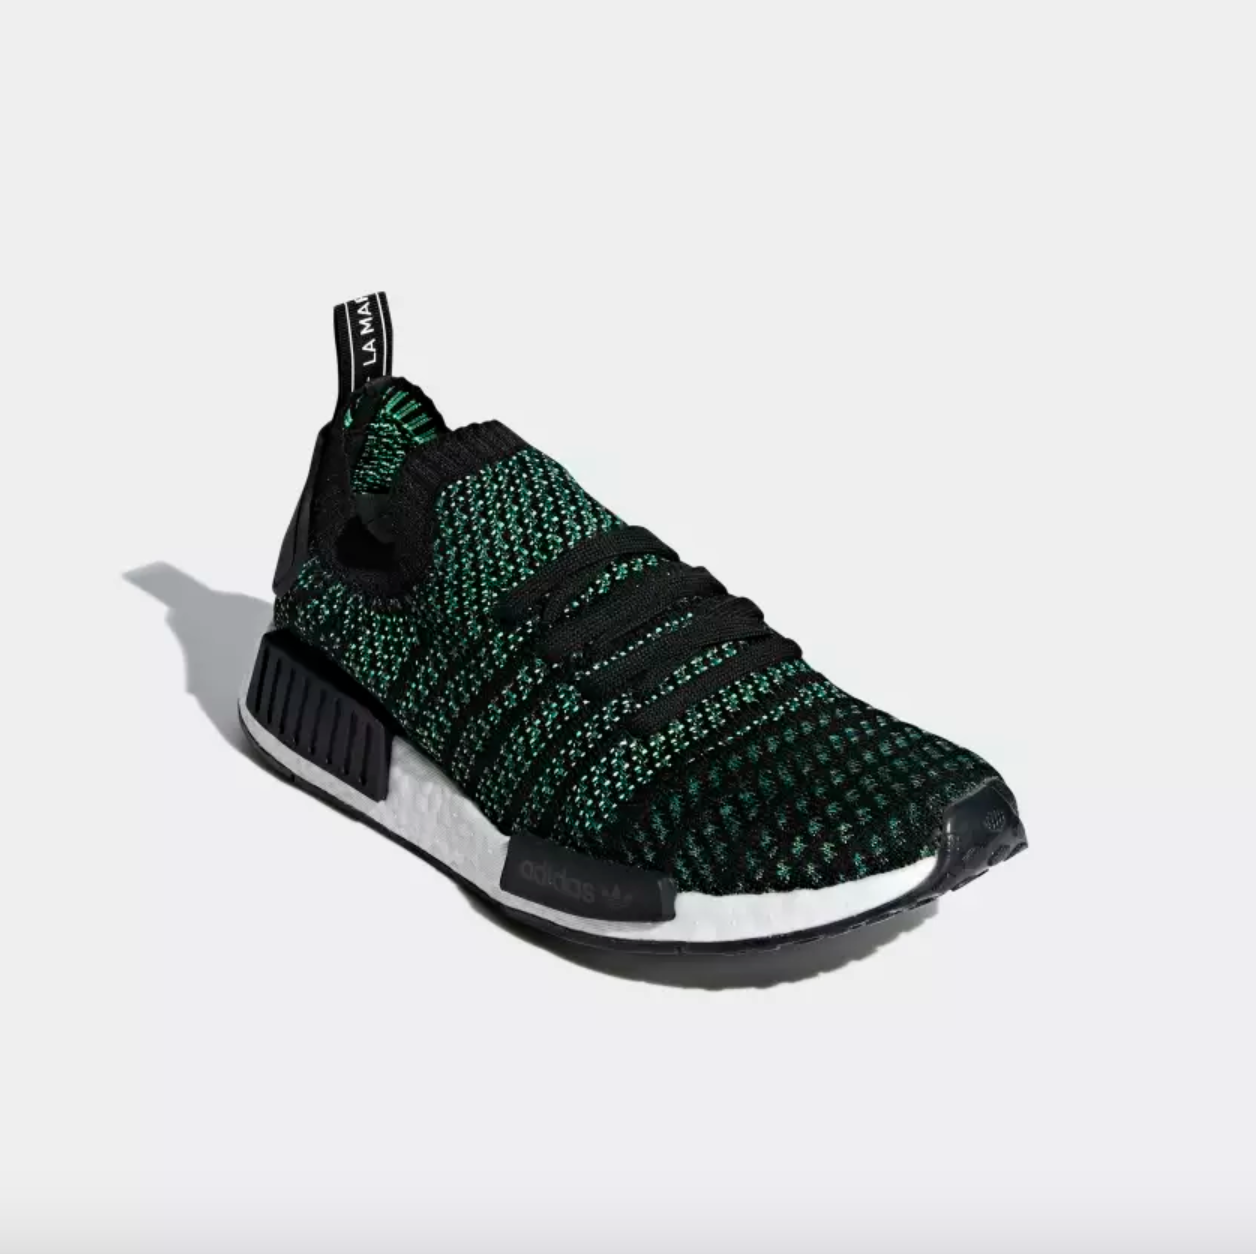 adidas men's md racer primeknit shoes